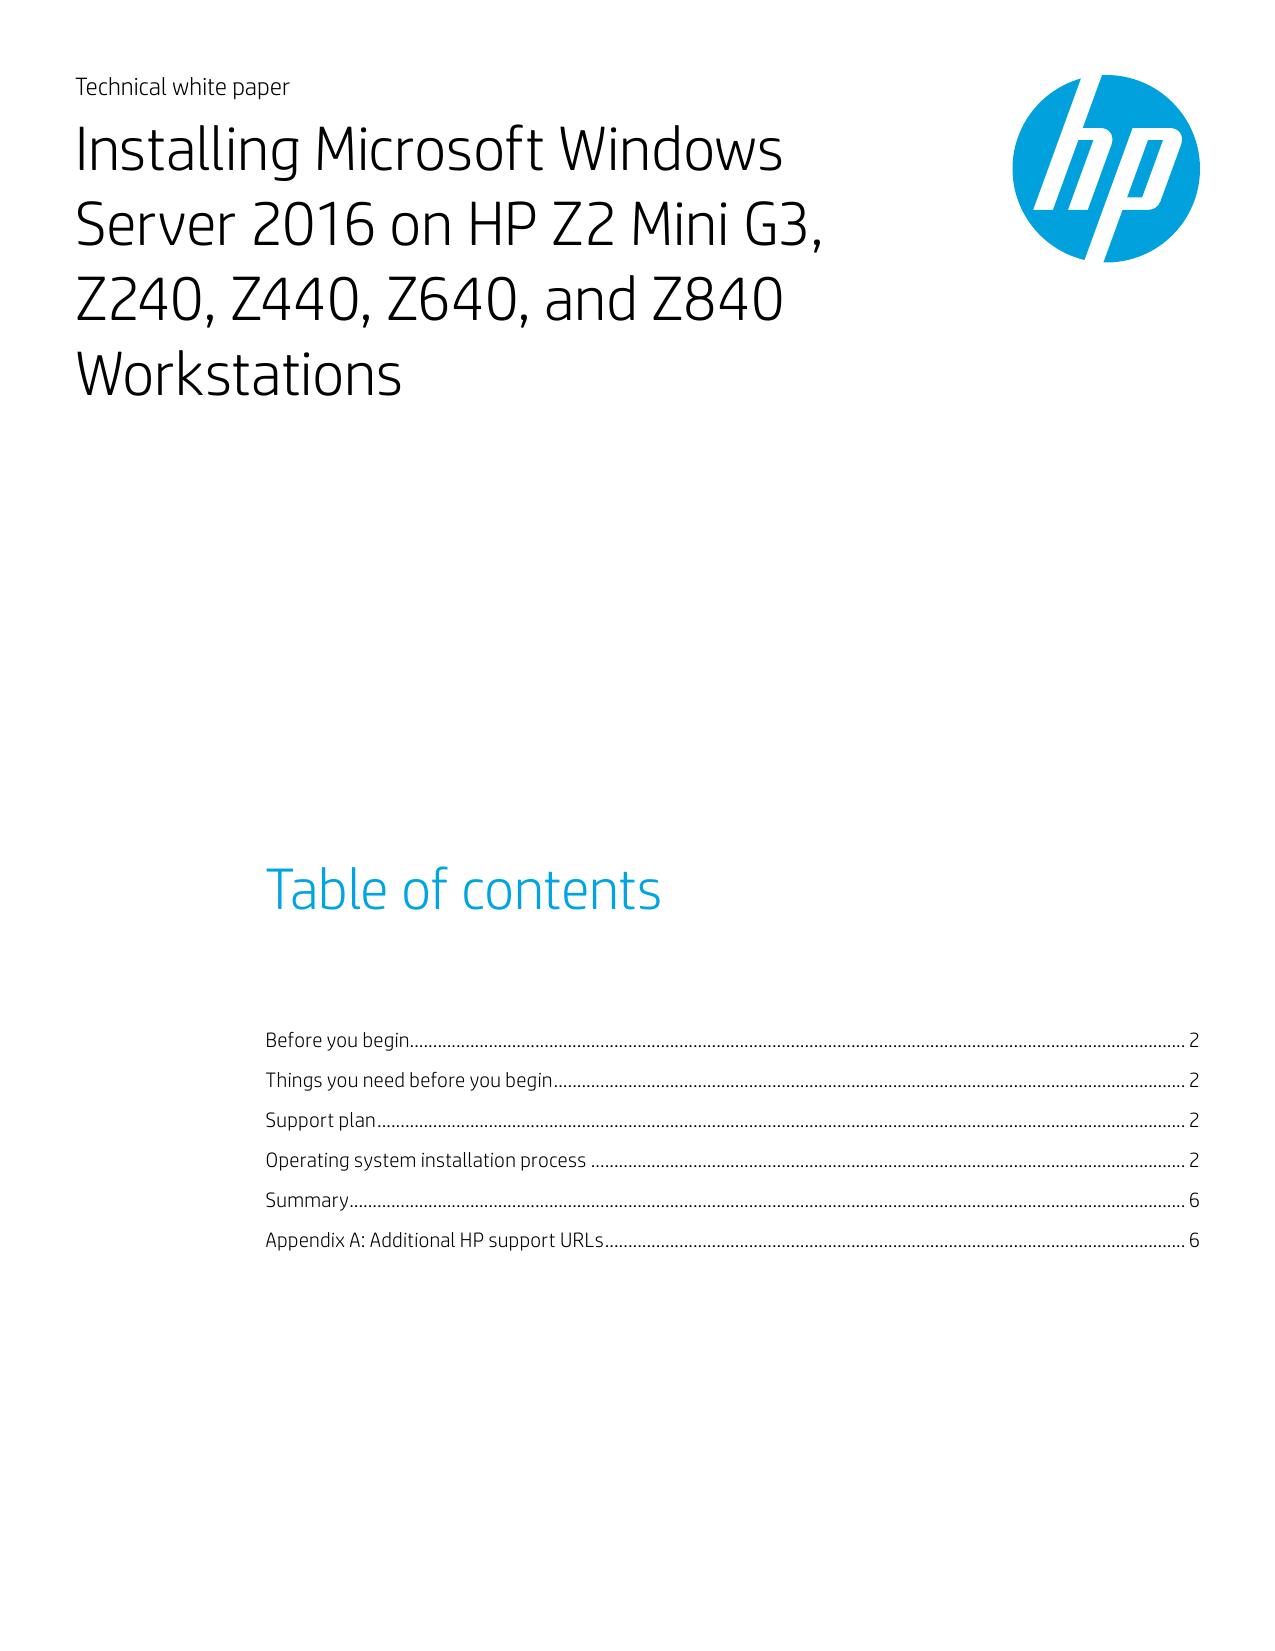 Installing Microsoft Windows Server 2016 on HP Z2 Mini G3